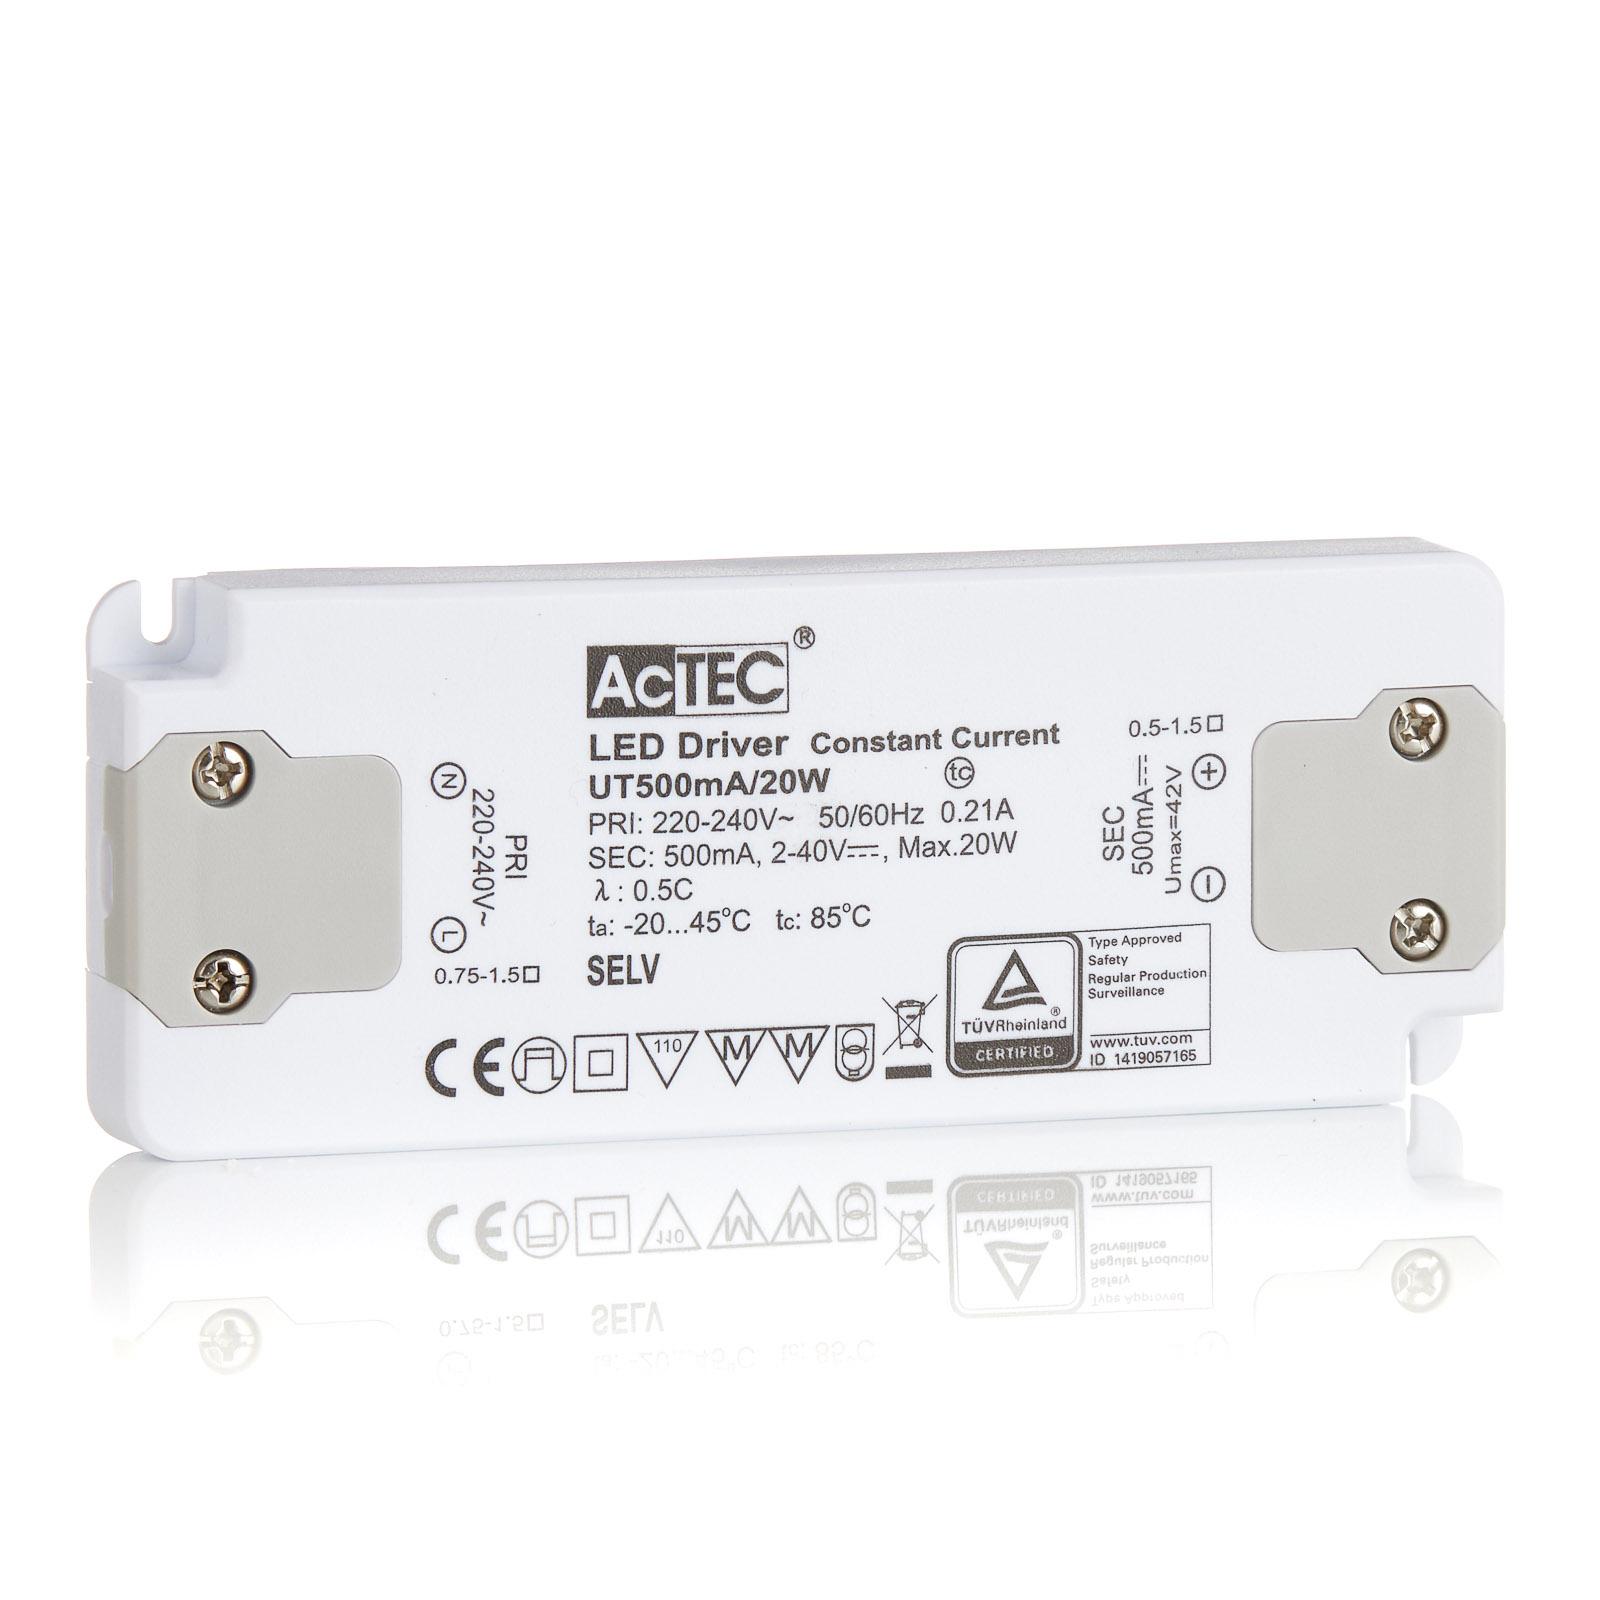 AcTEC Slim driver LED CC 500mA, 20W